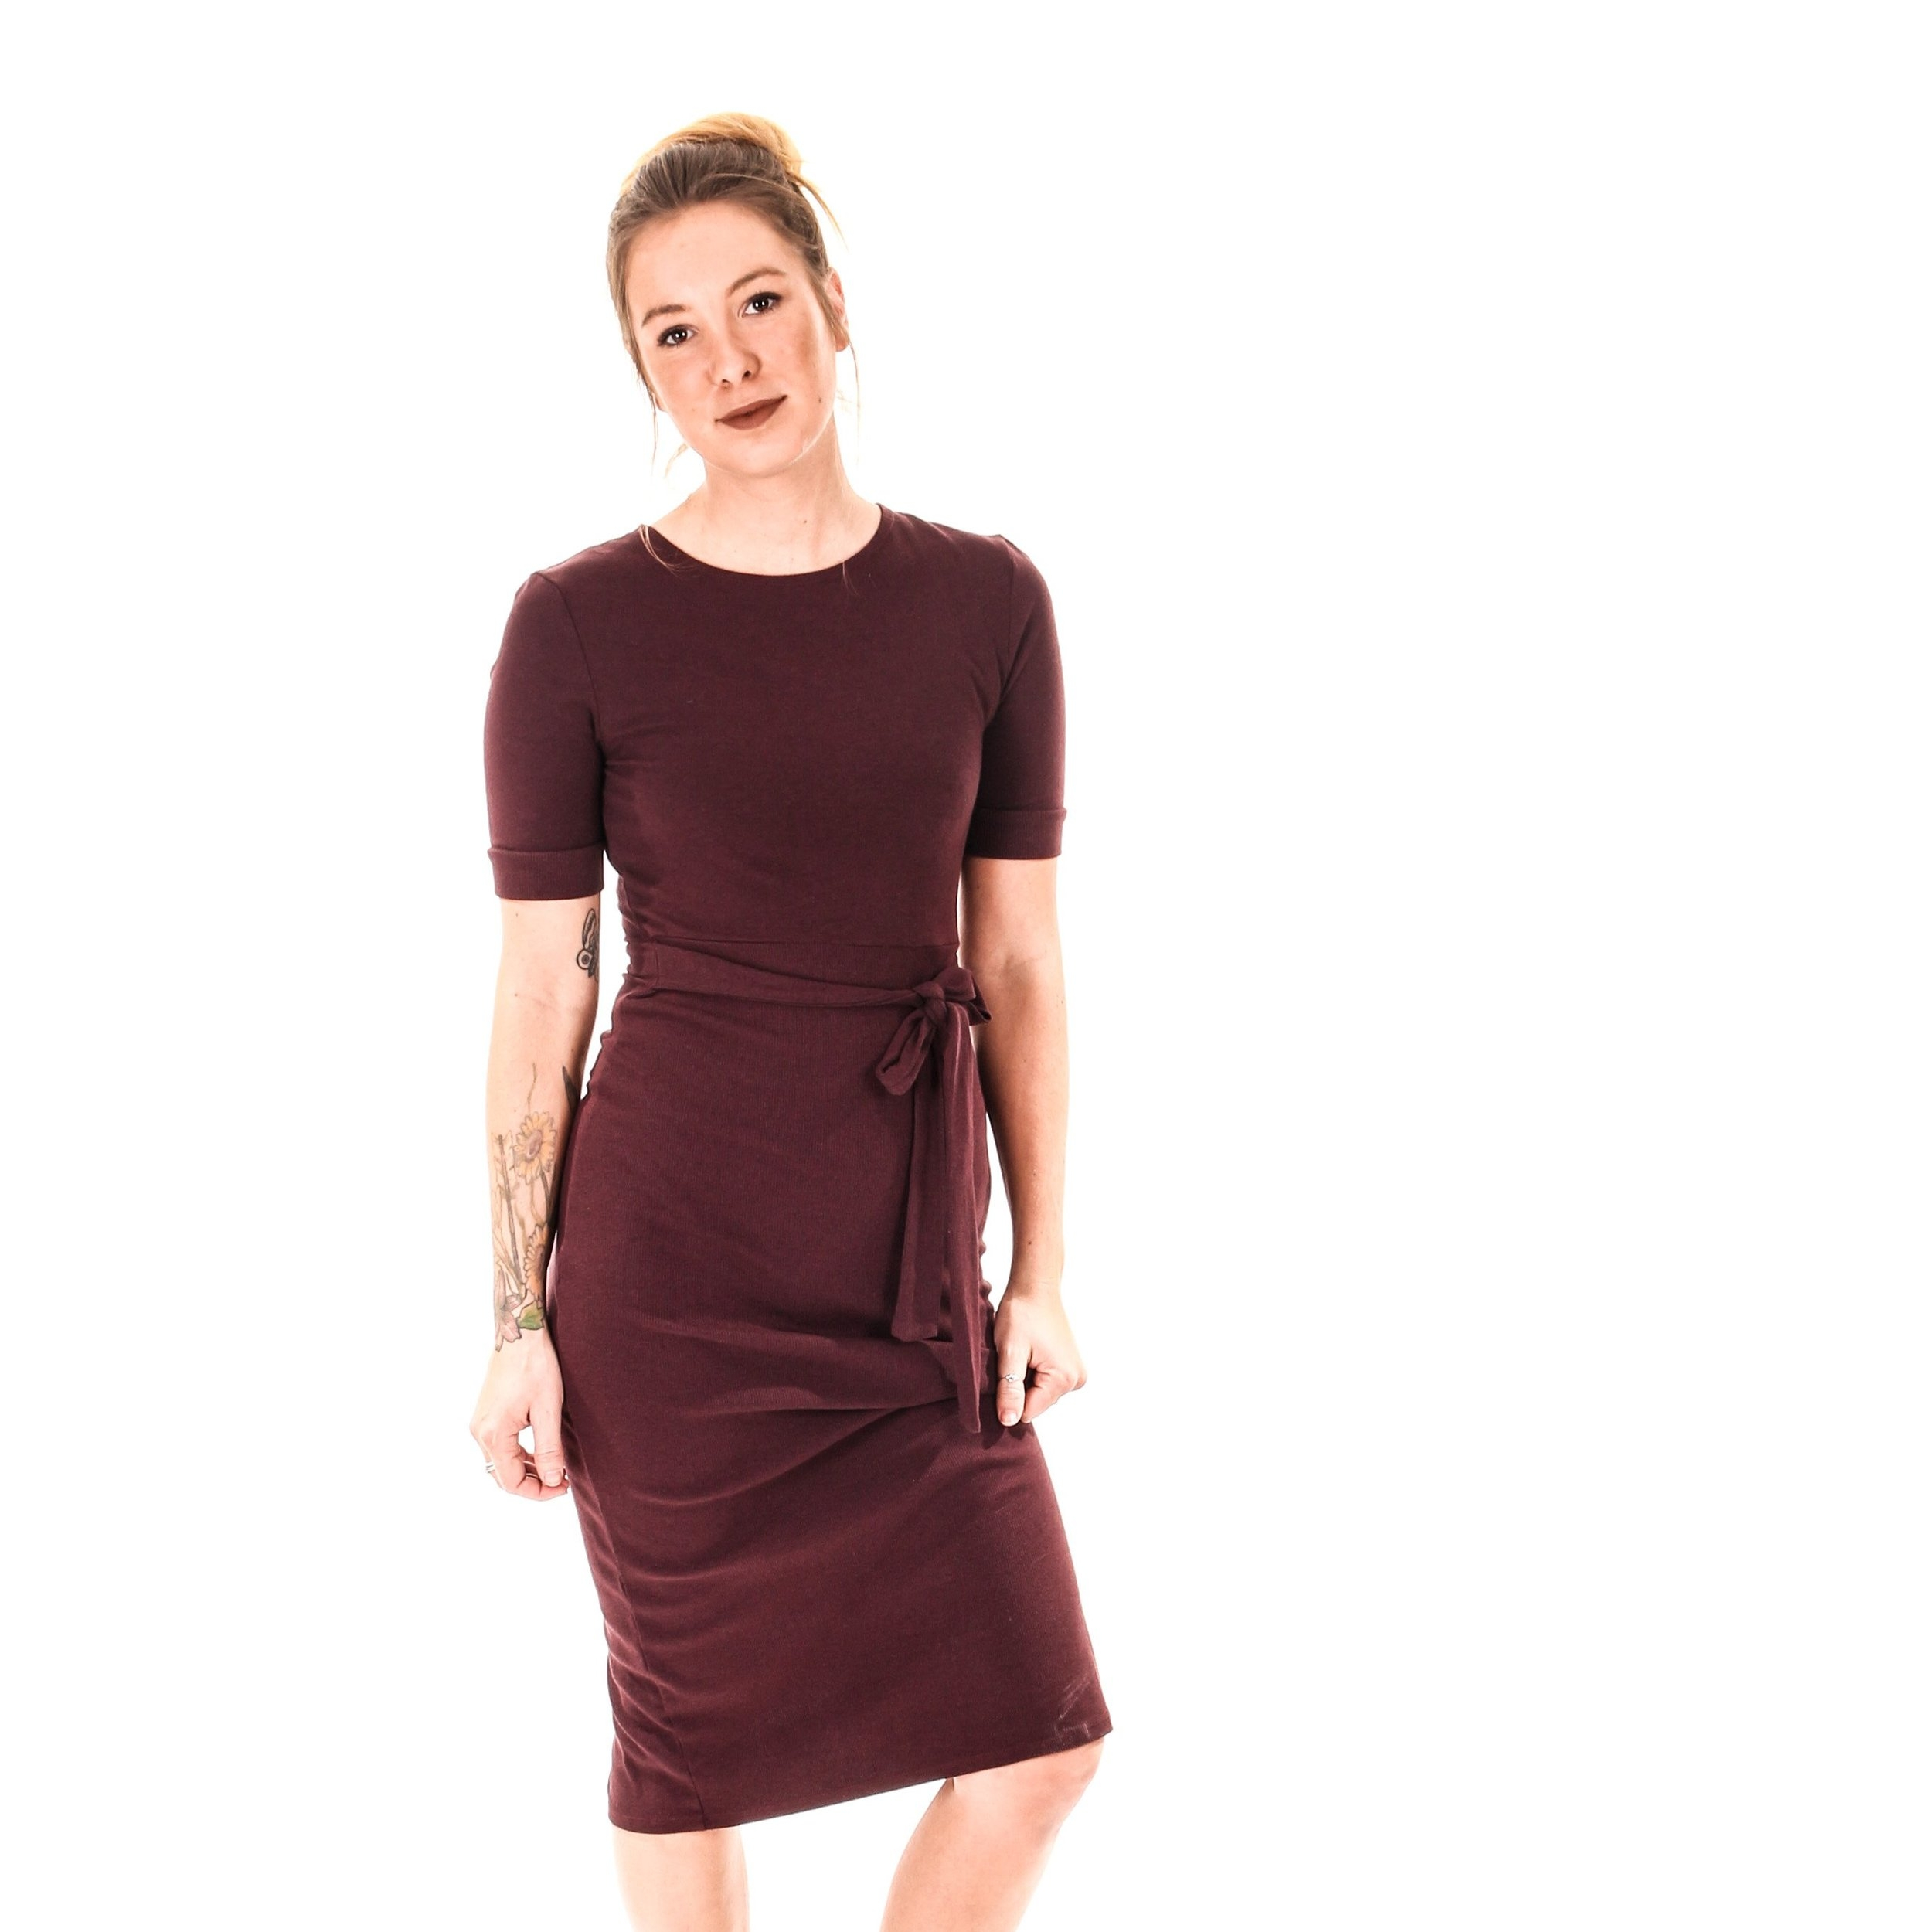 Evalina Dress ,  Joon + Co . $128  *use code s ustainablychic30  for 30% off*